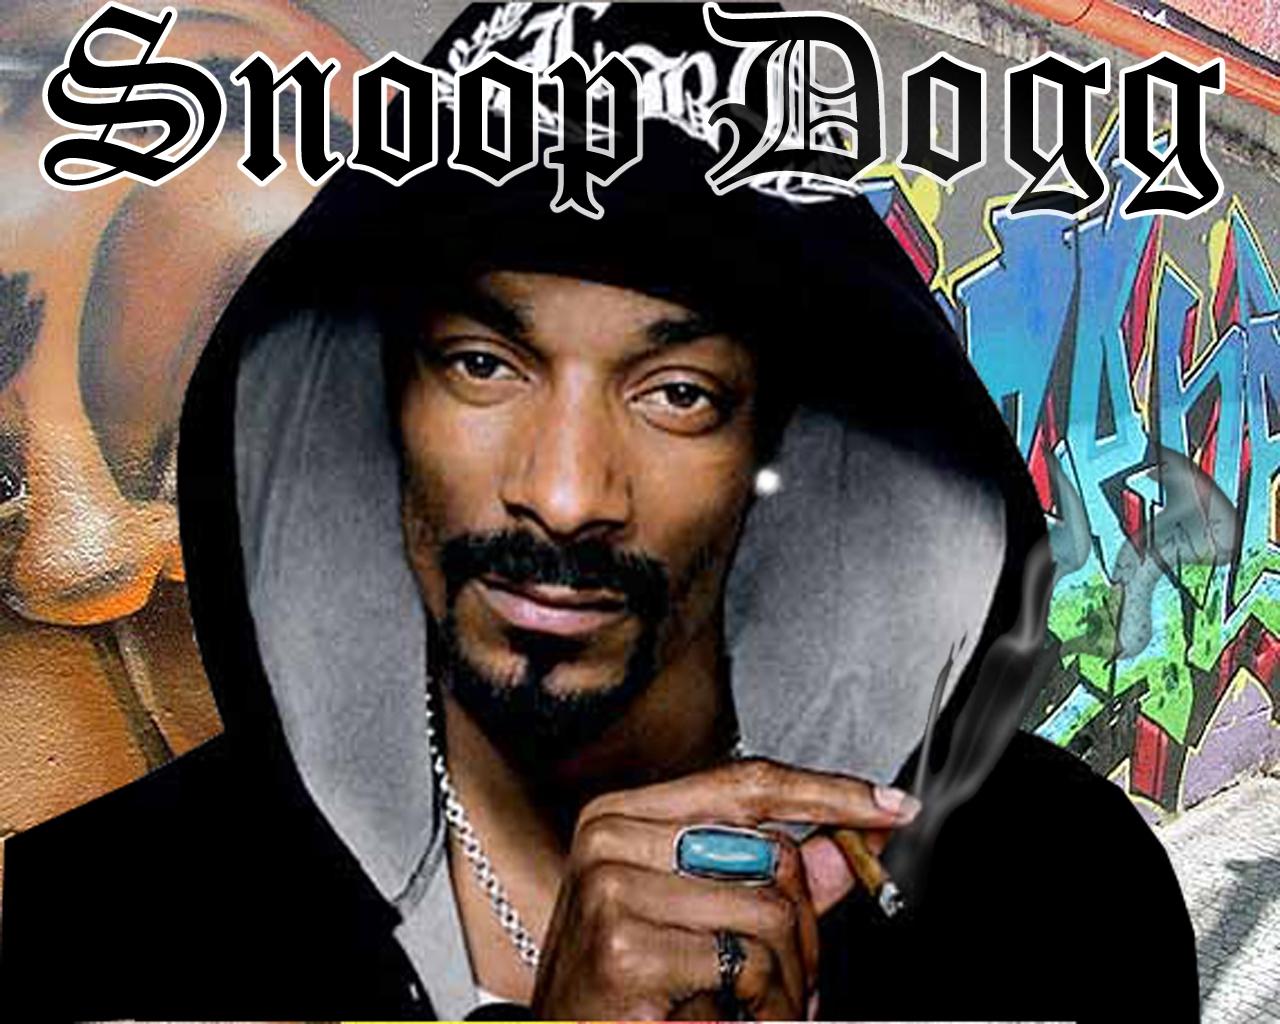 download snoop dogg - photo #44